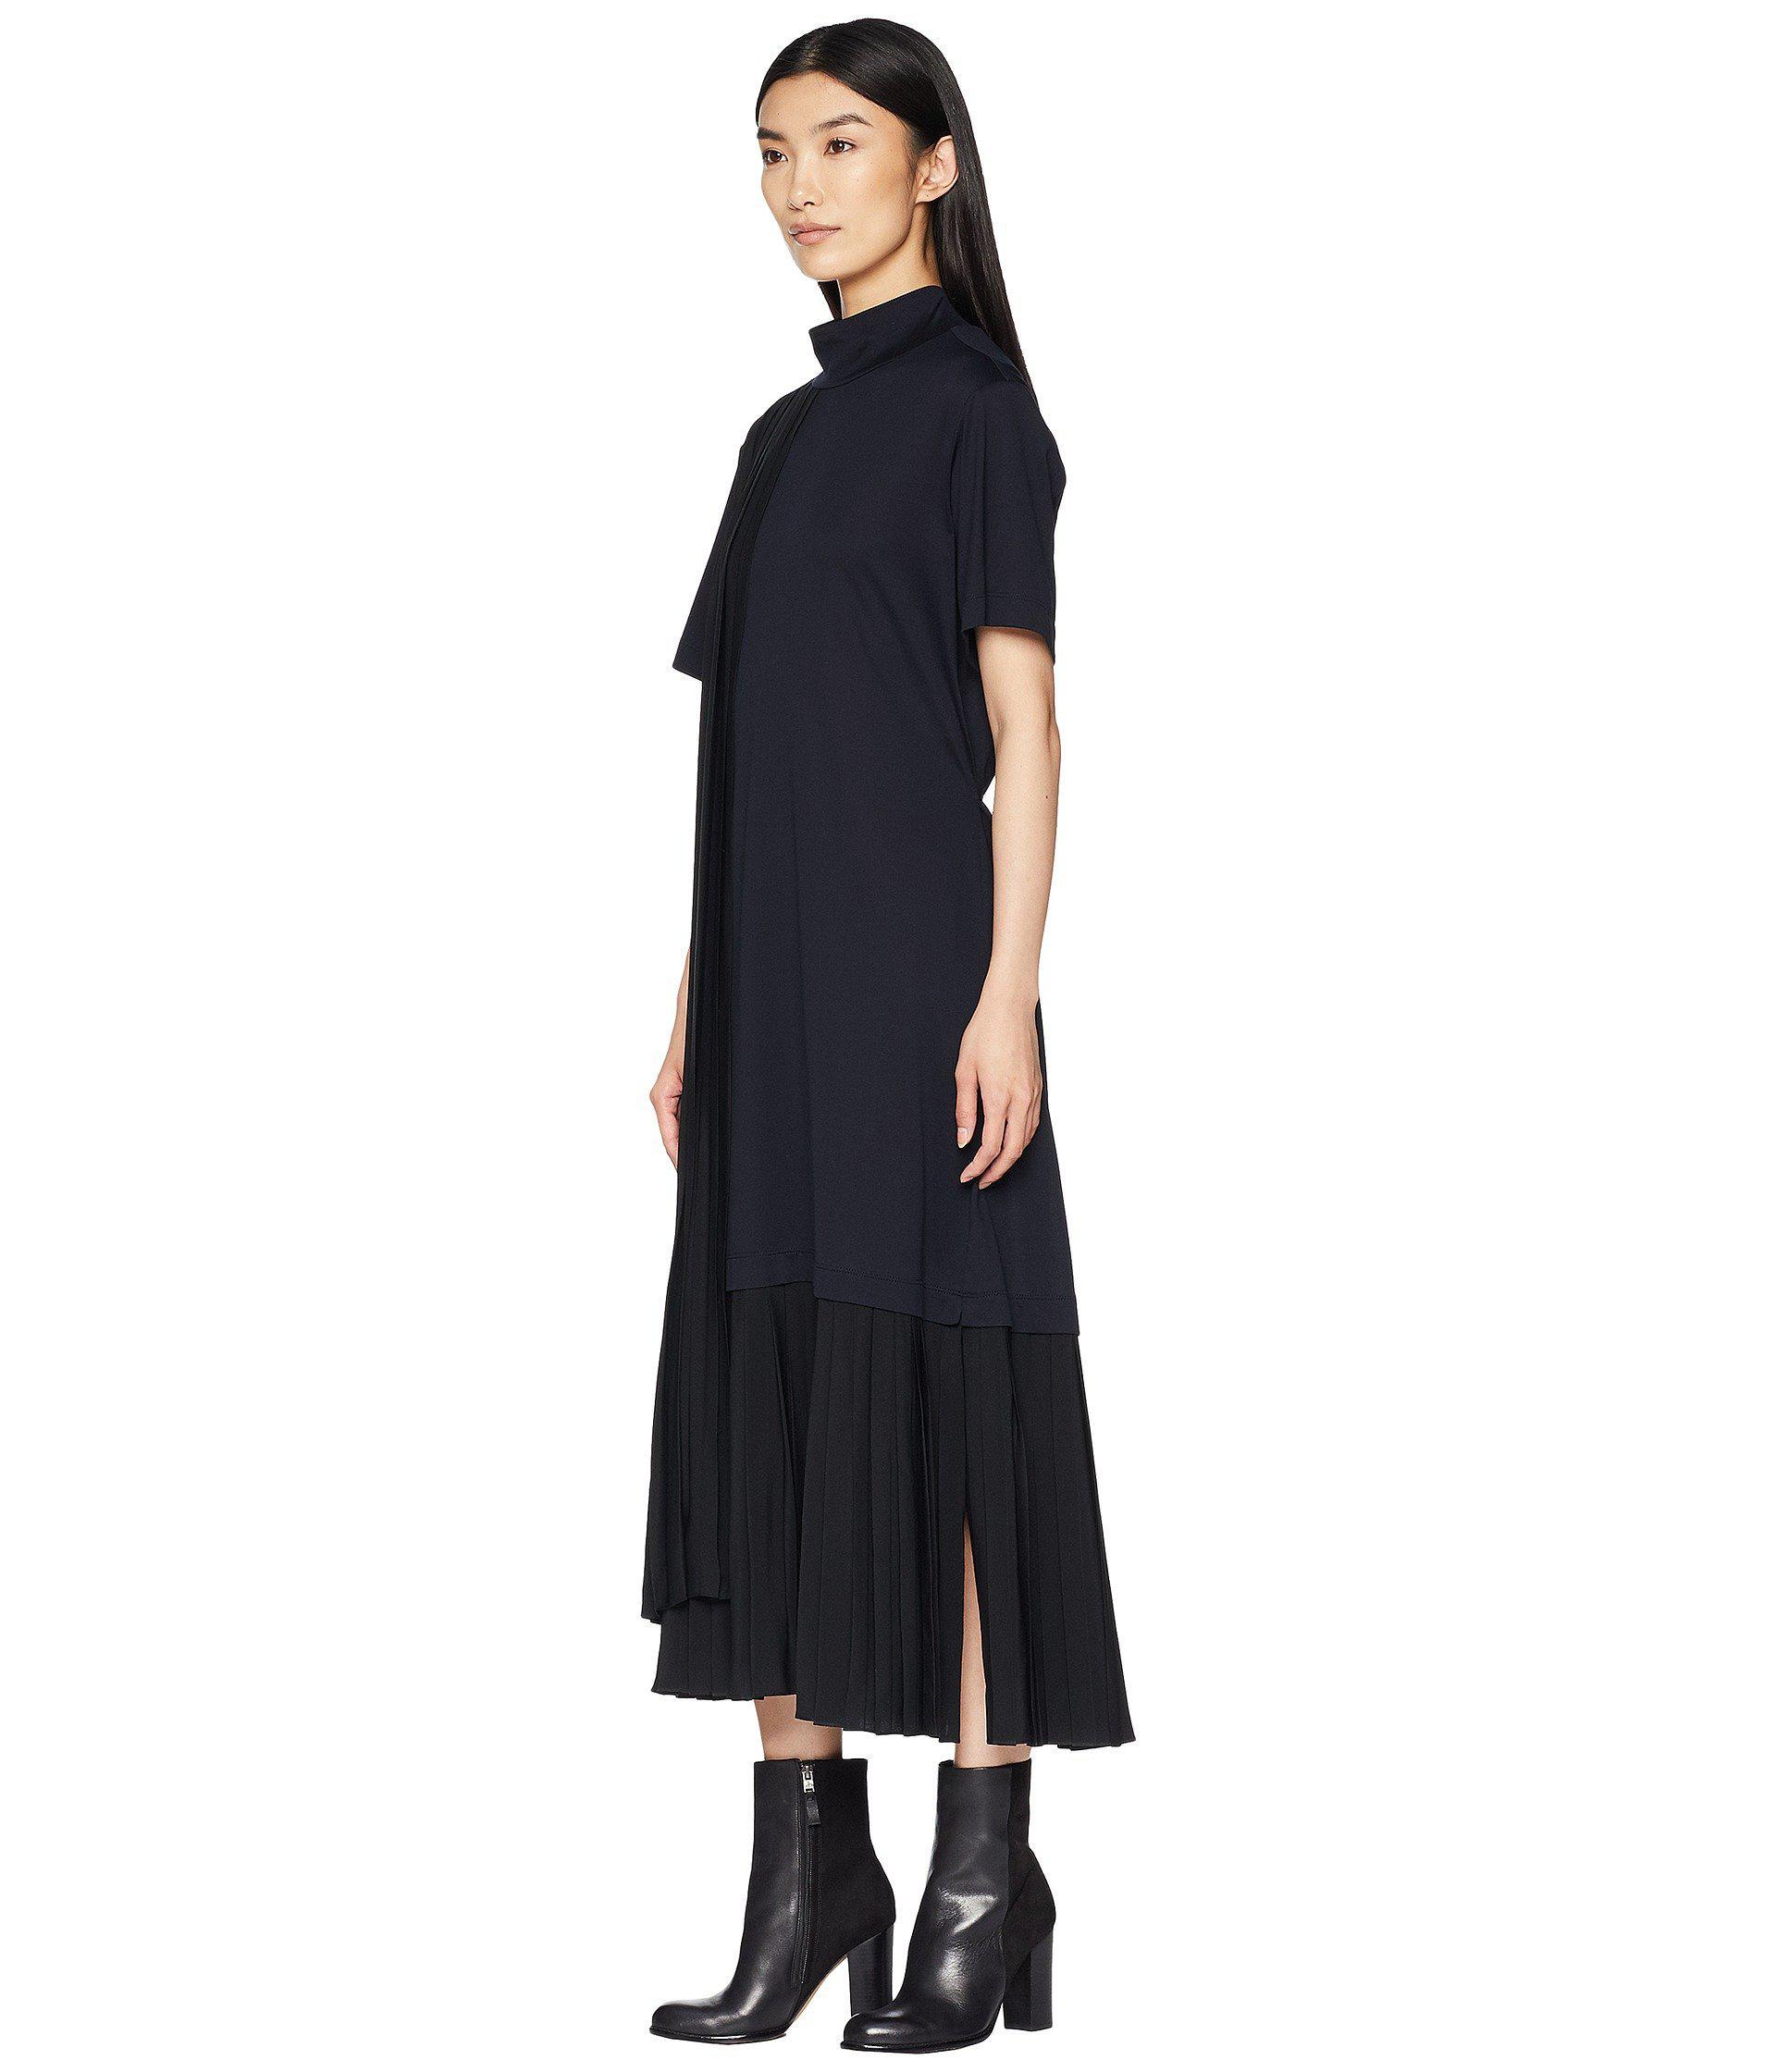 e63d5037 Jil Sander Navy Short Sleeve Dress Turtleneck And Plisst Details (navy)  Women's Dress in Blue - Lyst